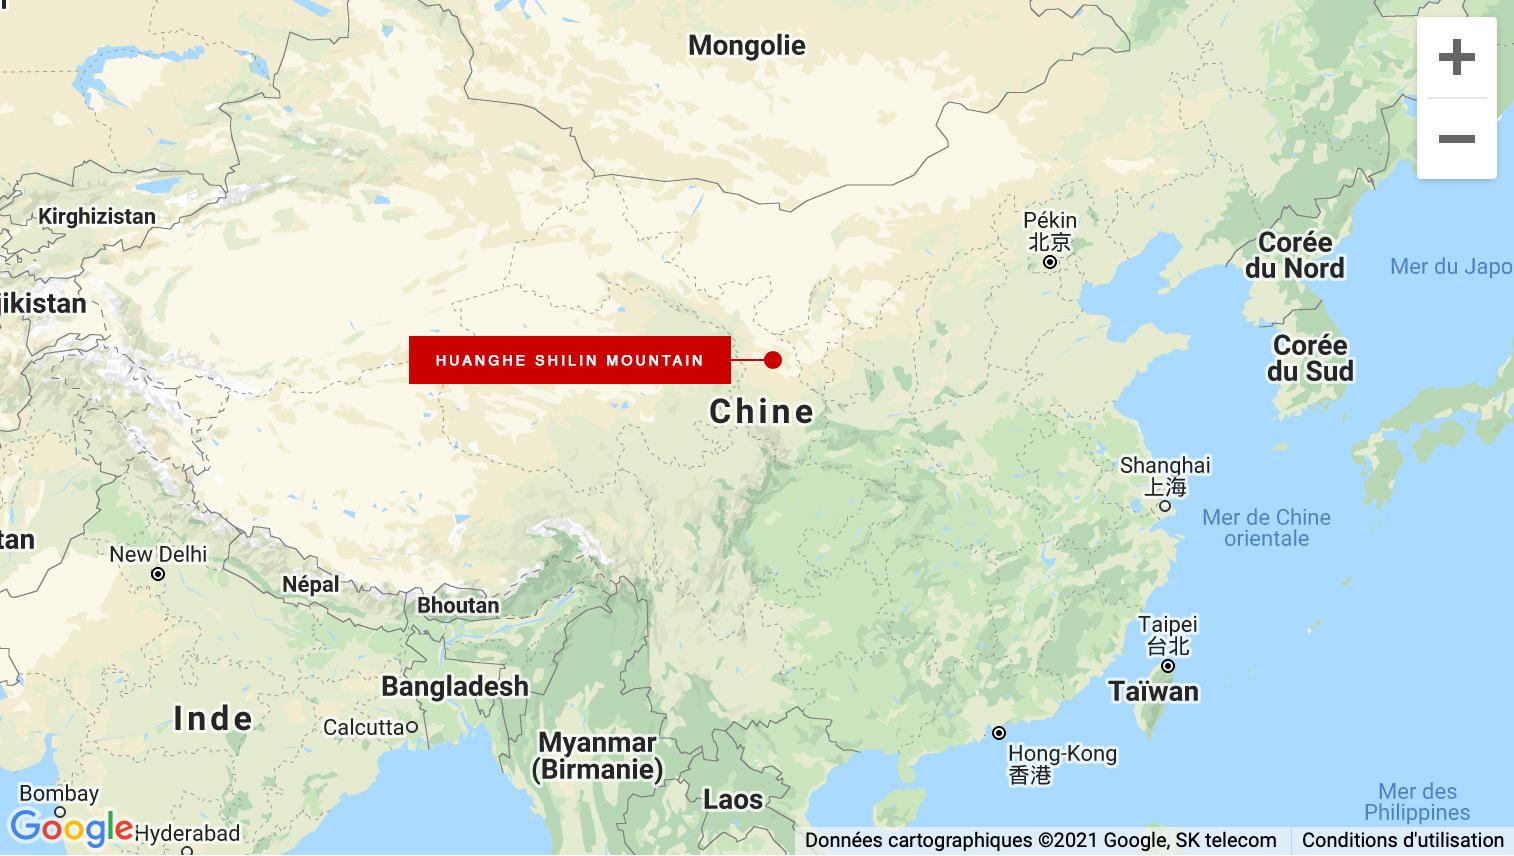 21 morts sur l'ultra trail Huanghe Shilin Mountain en Chine